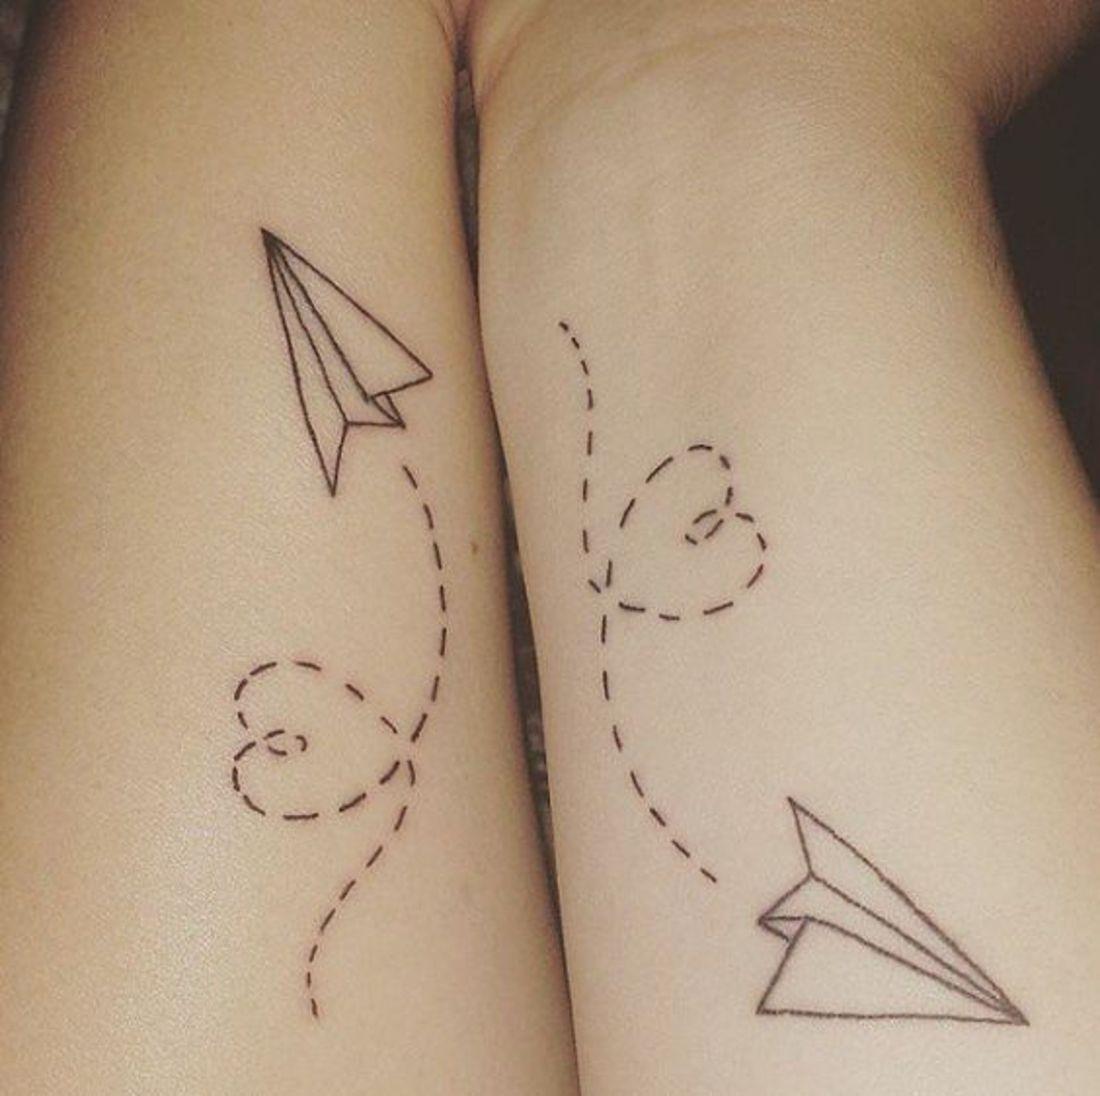 1001 Ideas Y Consejos De Tatuajes Para Parejas Tattoo